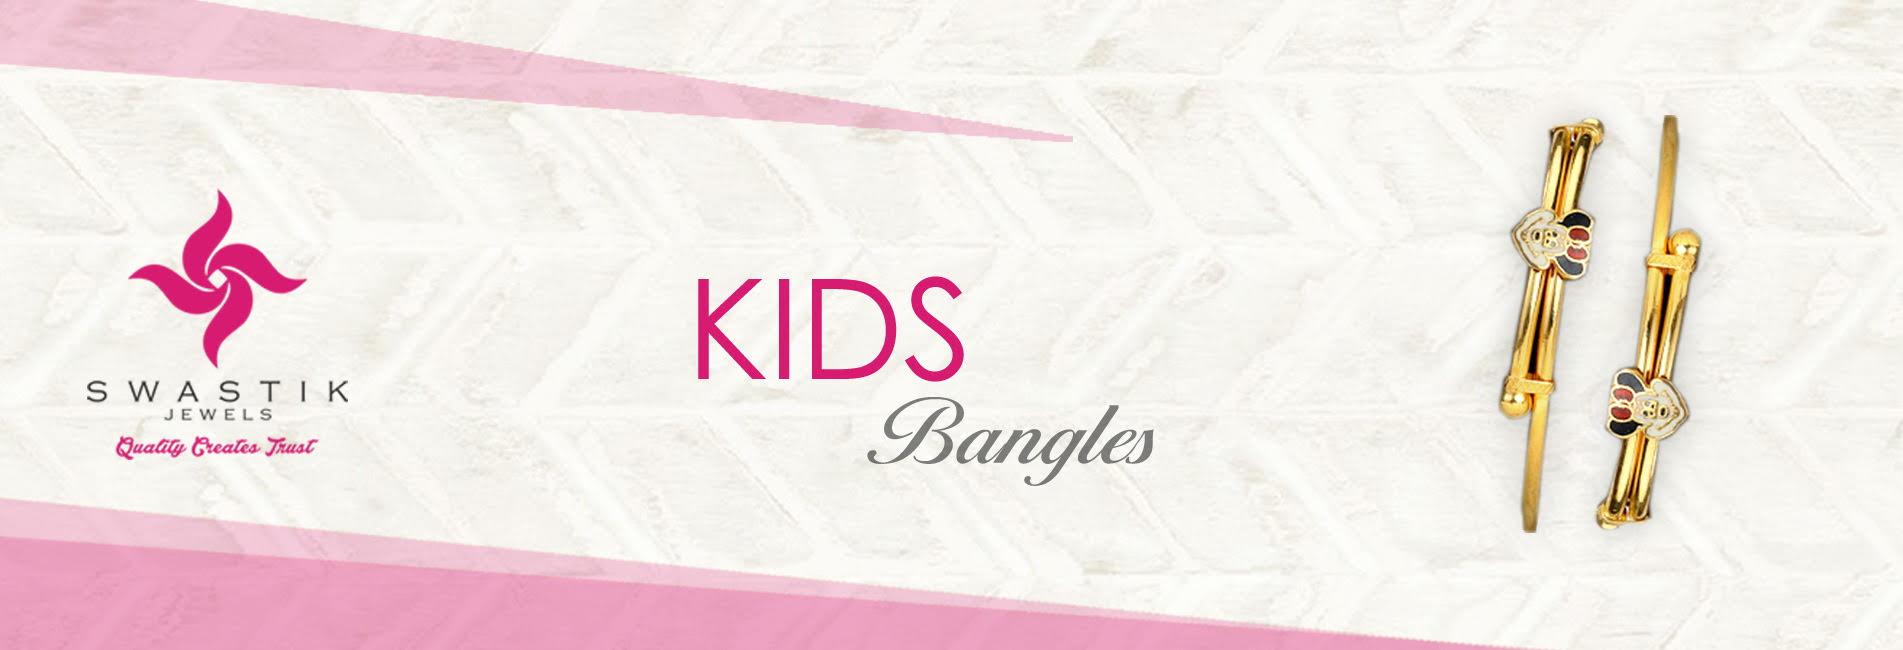 Kids Bangles